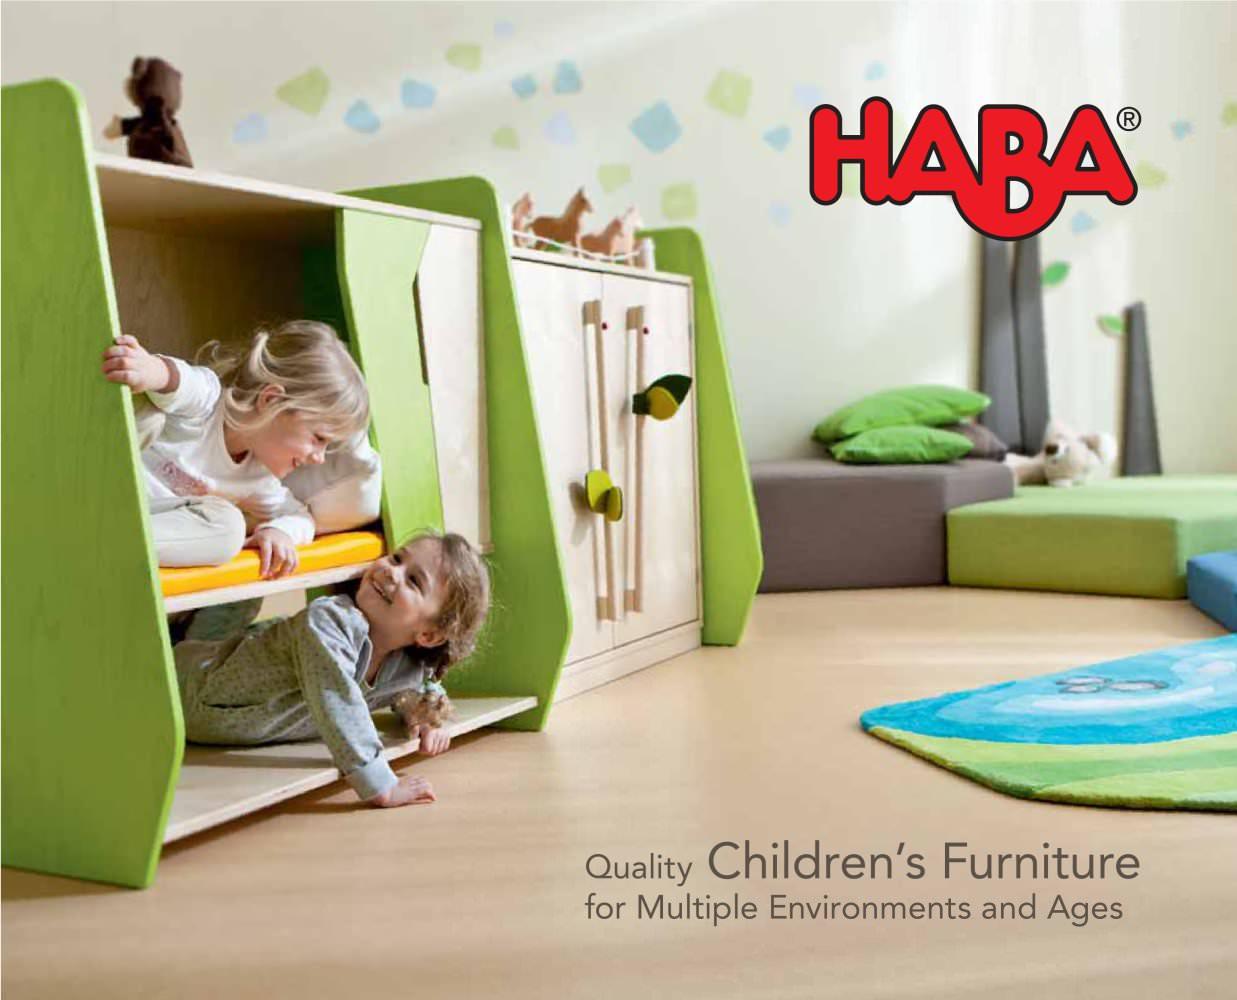 Charmant HABA   Quality Childrenu0027s Furniture   1 / 15 Pages